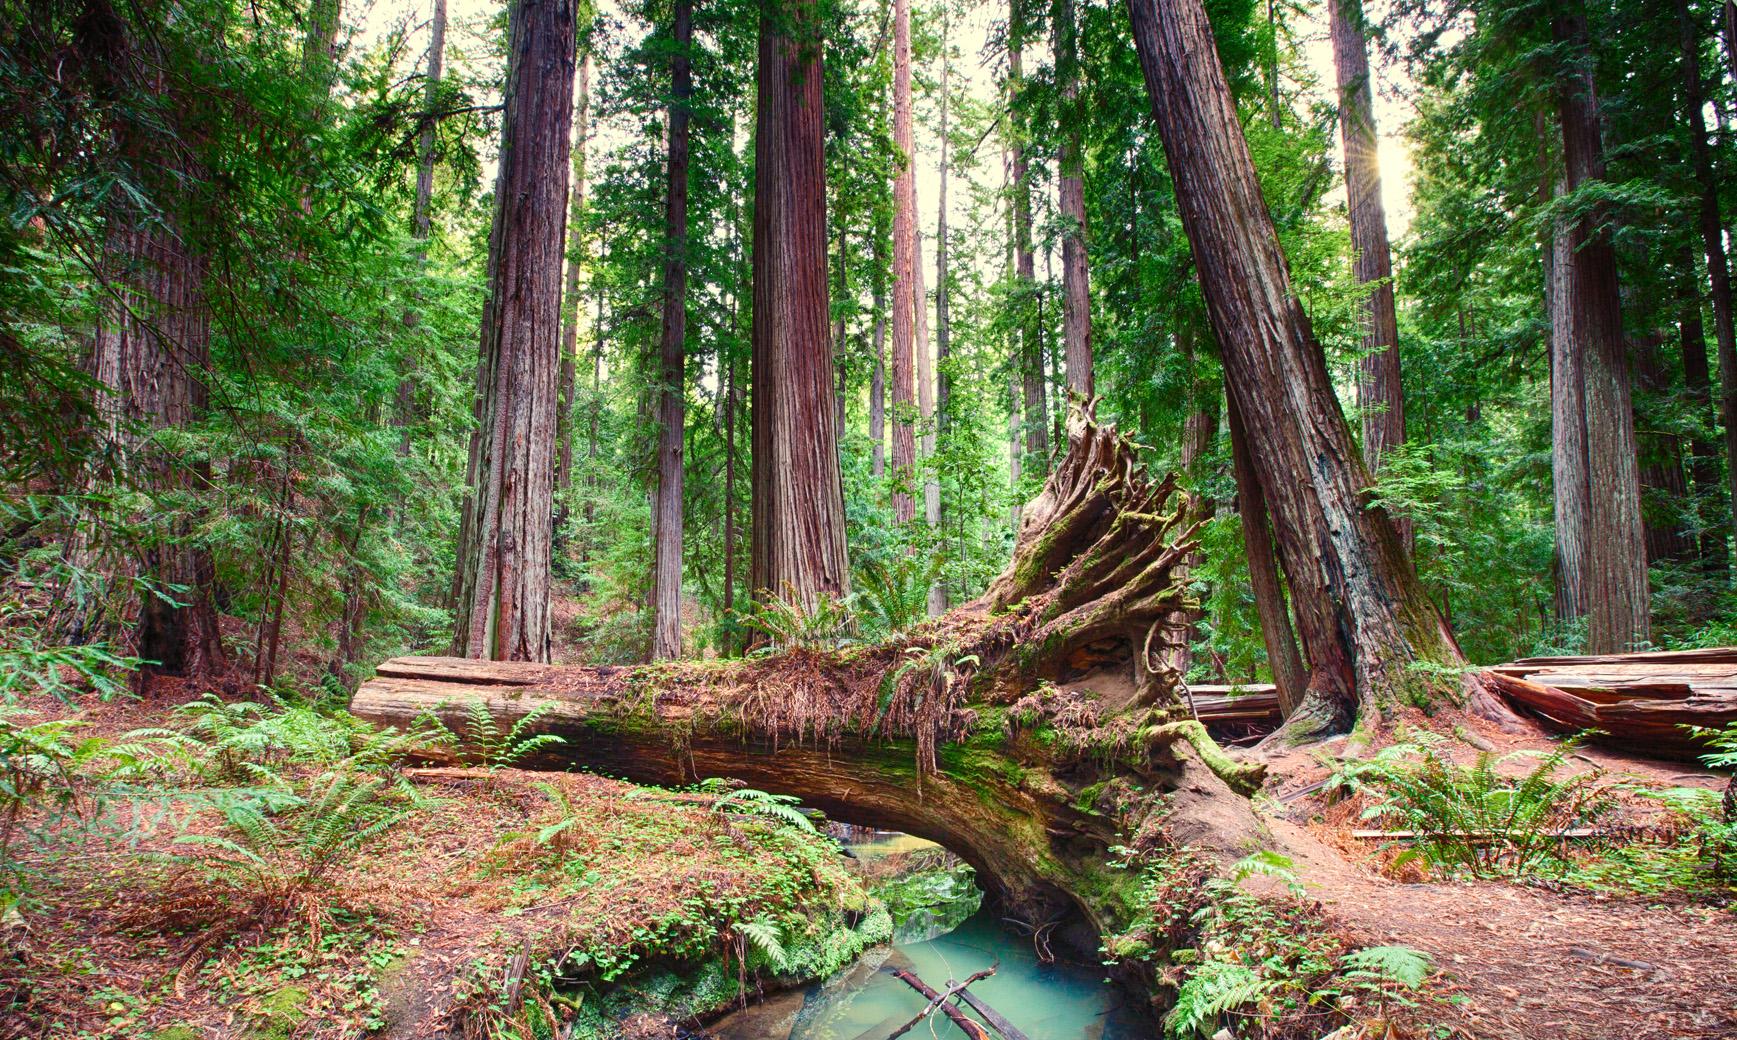 Montgomery Woods. Photo by June Ruckman